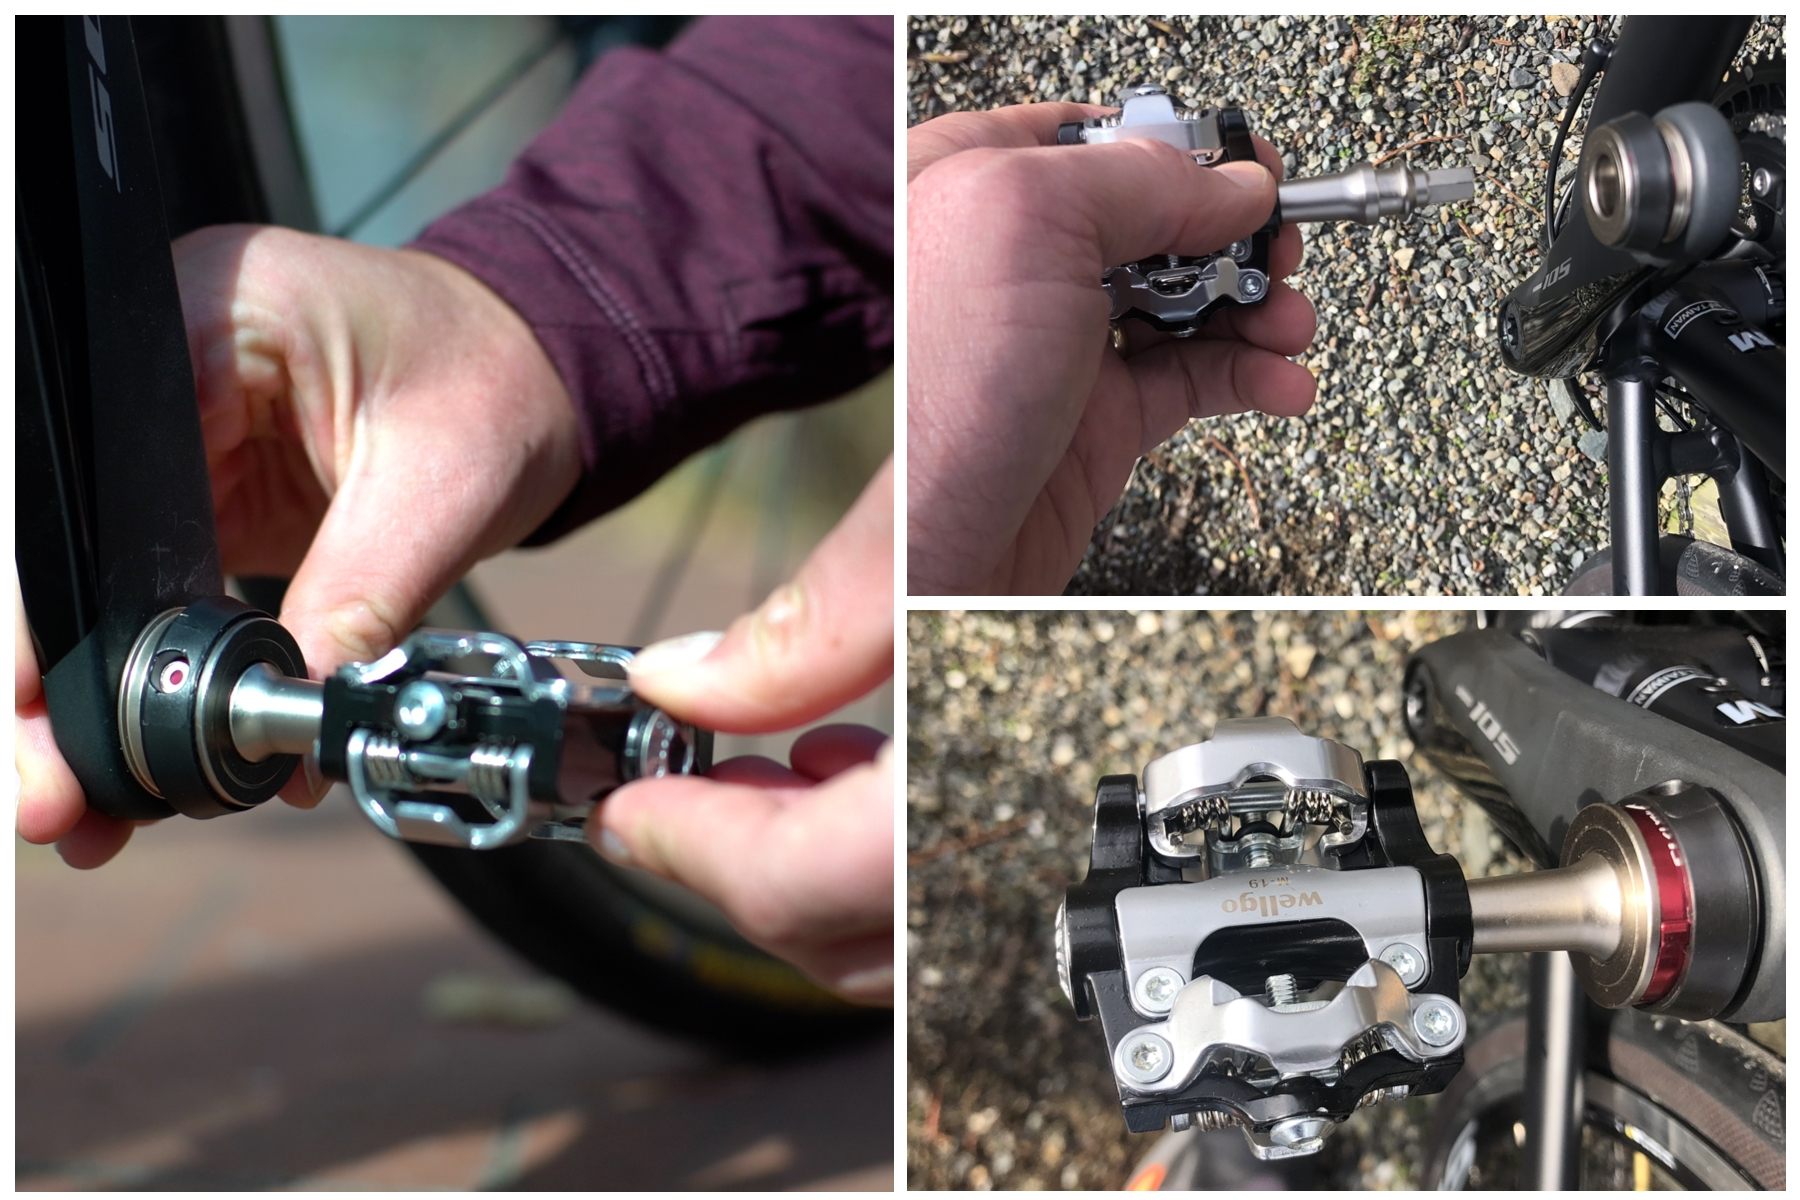 B. Flatbike Century popoff pedals